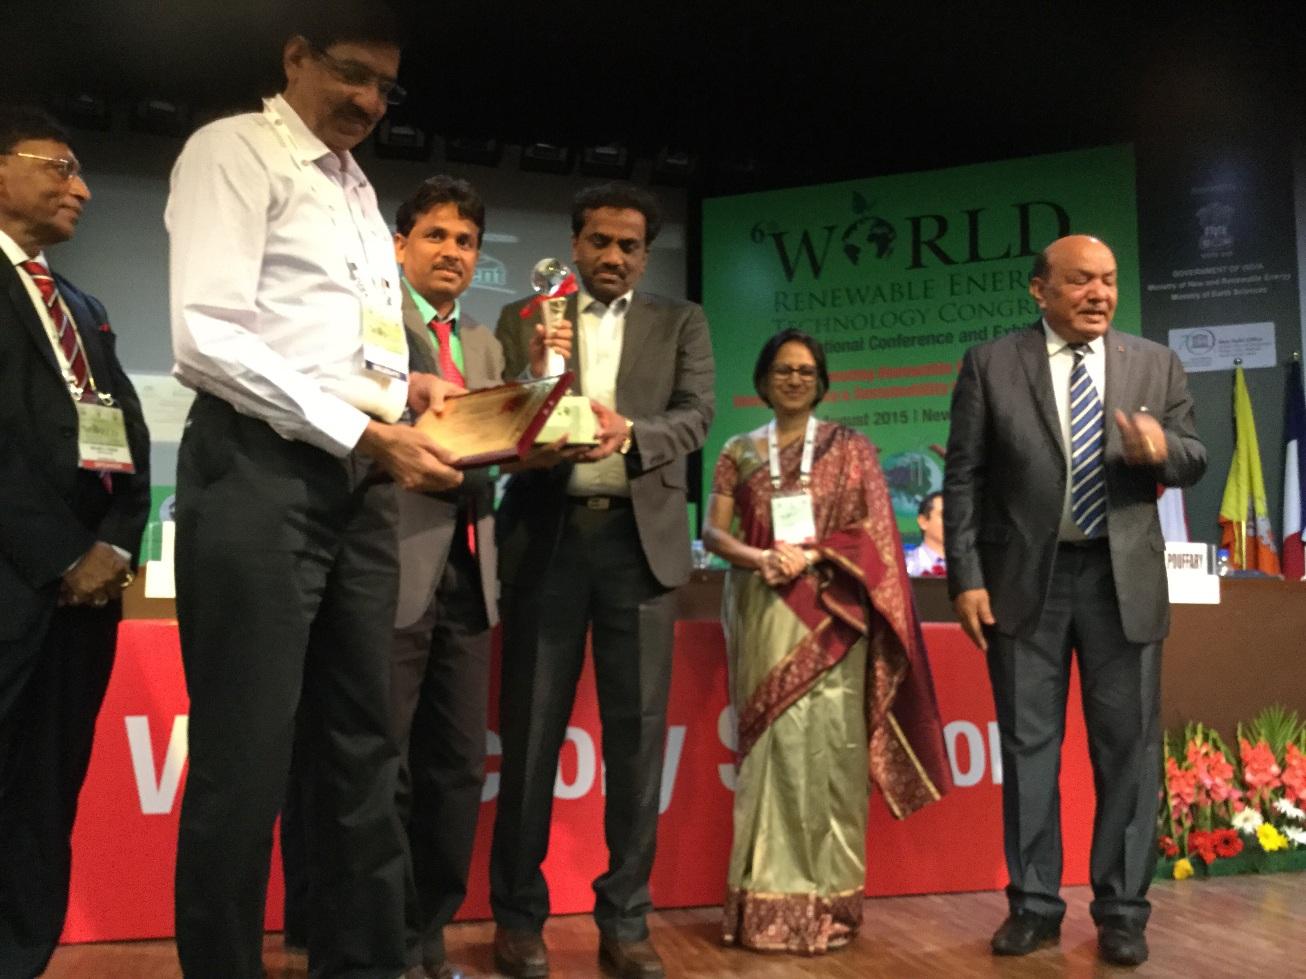 Award to JSPL Barbil